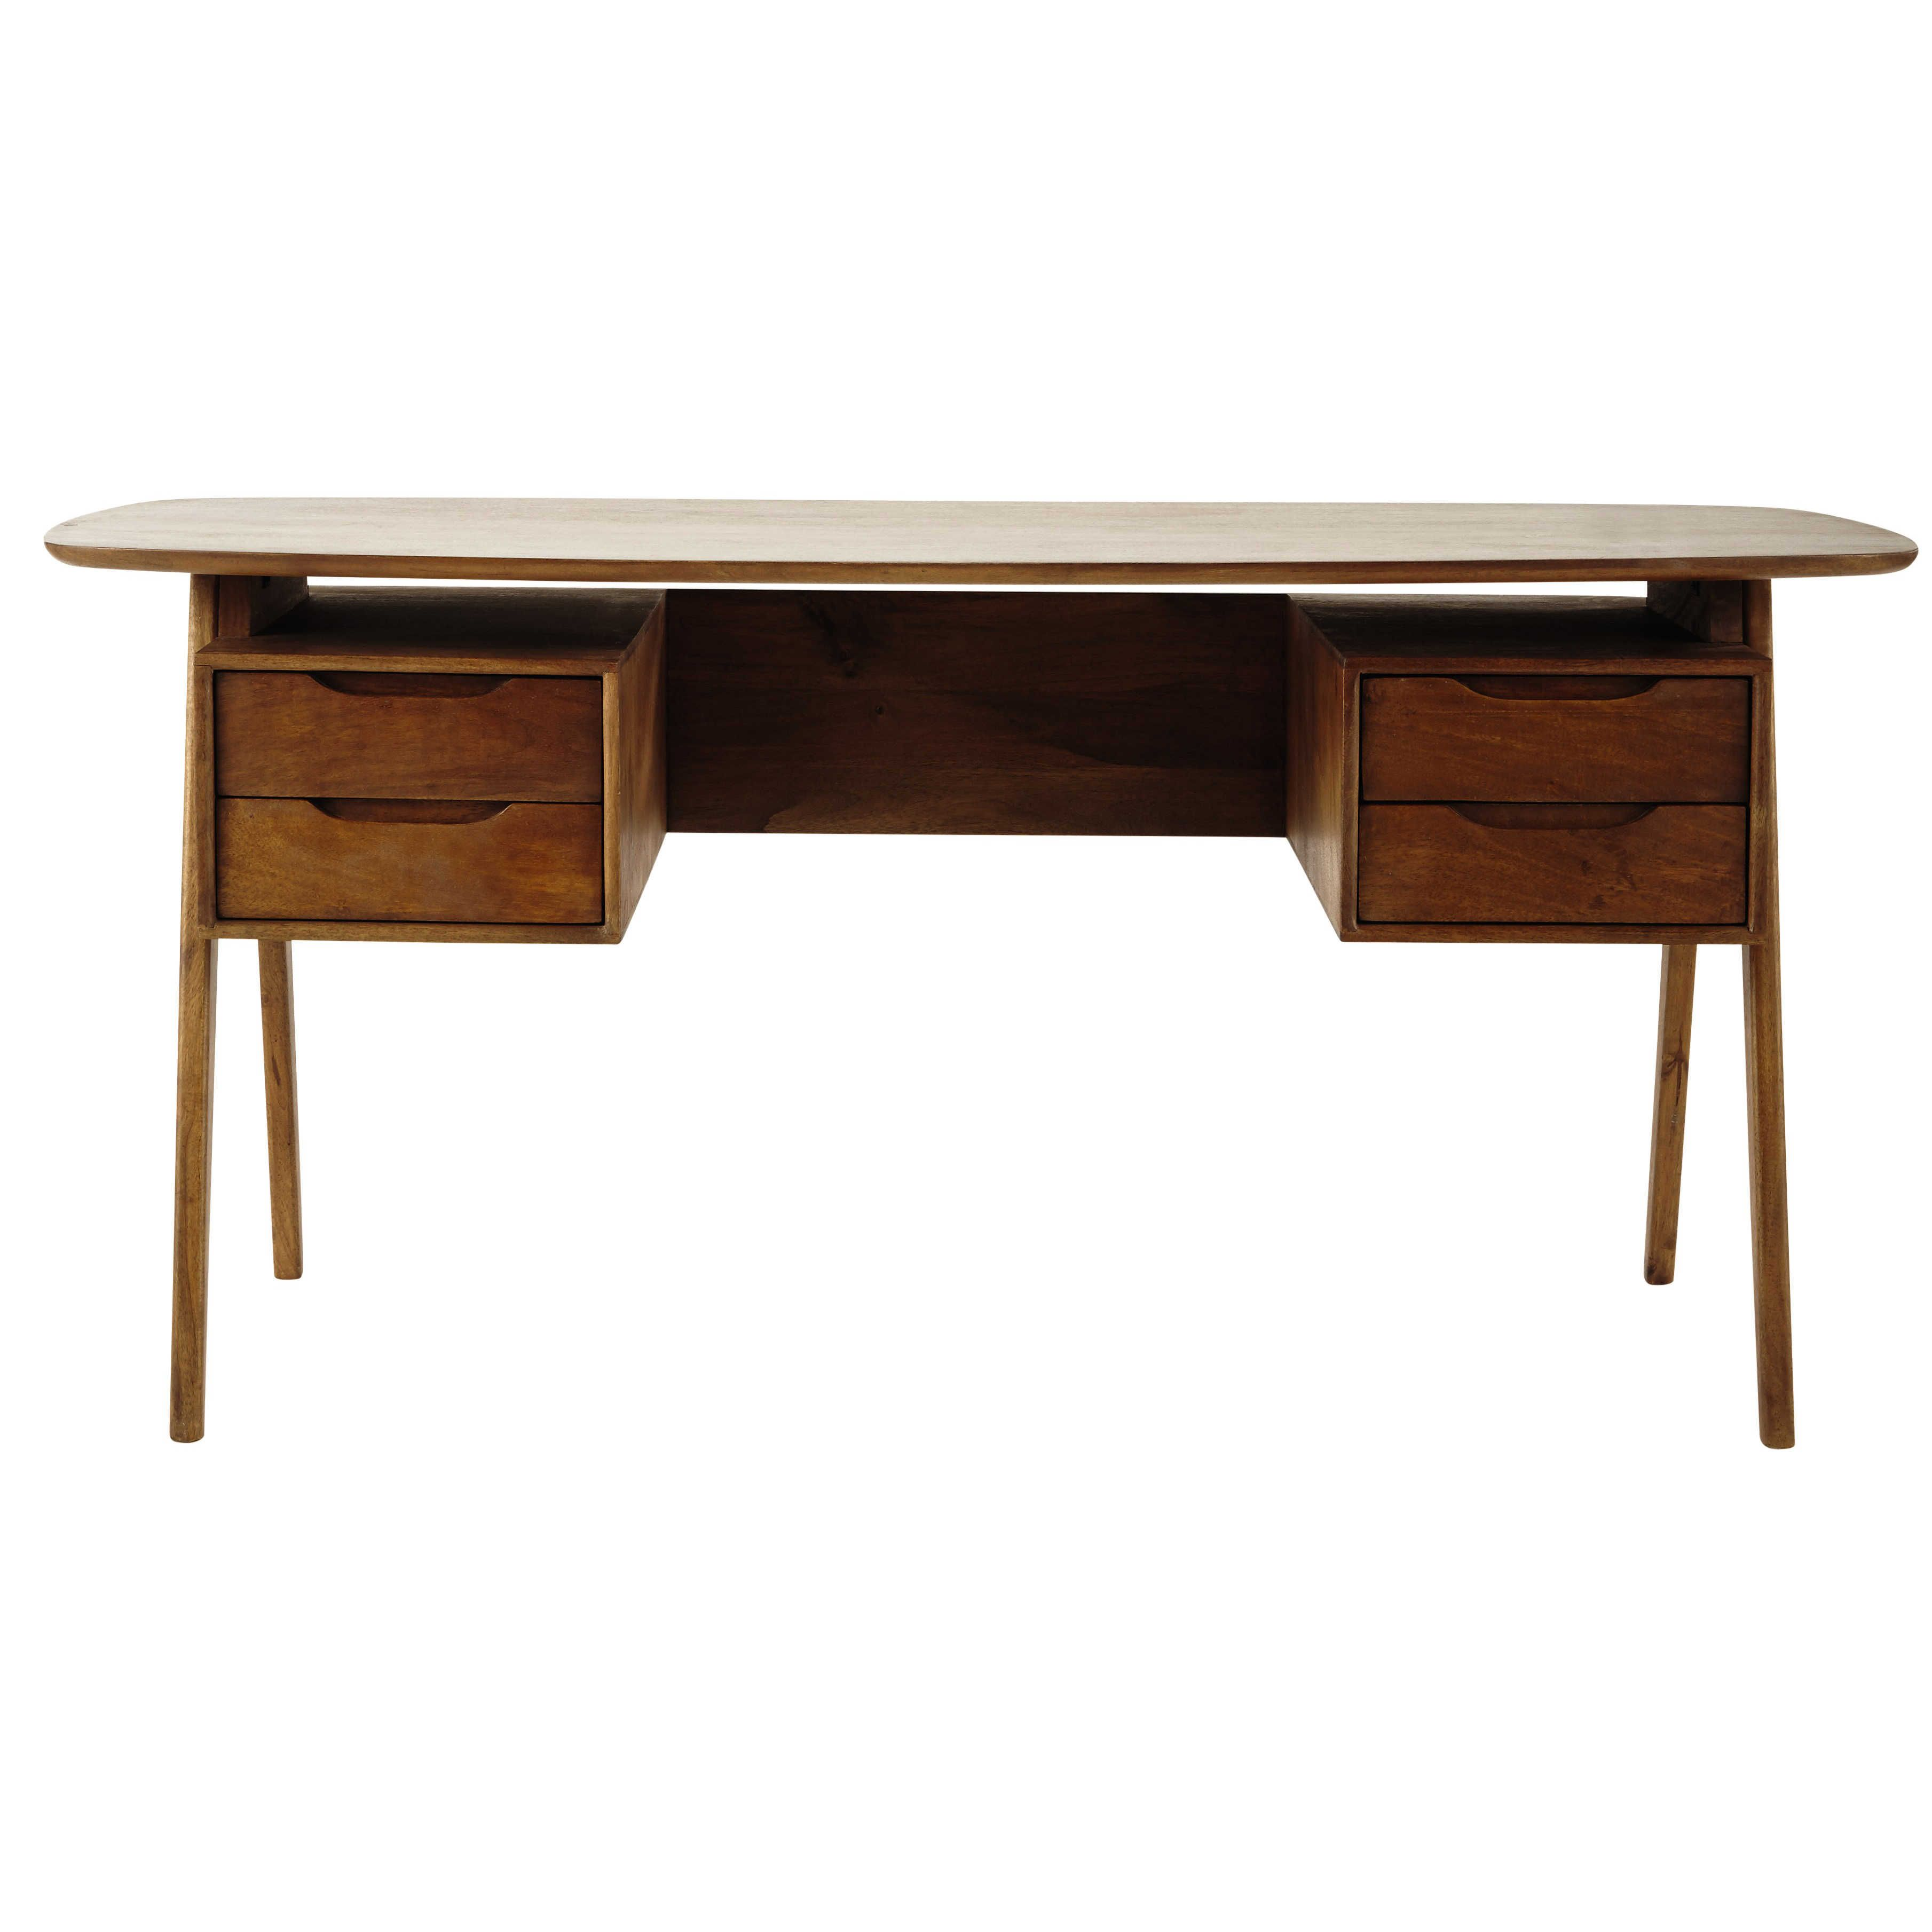 Mango wood vintage desk W 165cm Janeiro Study Pinterest